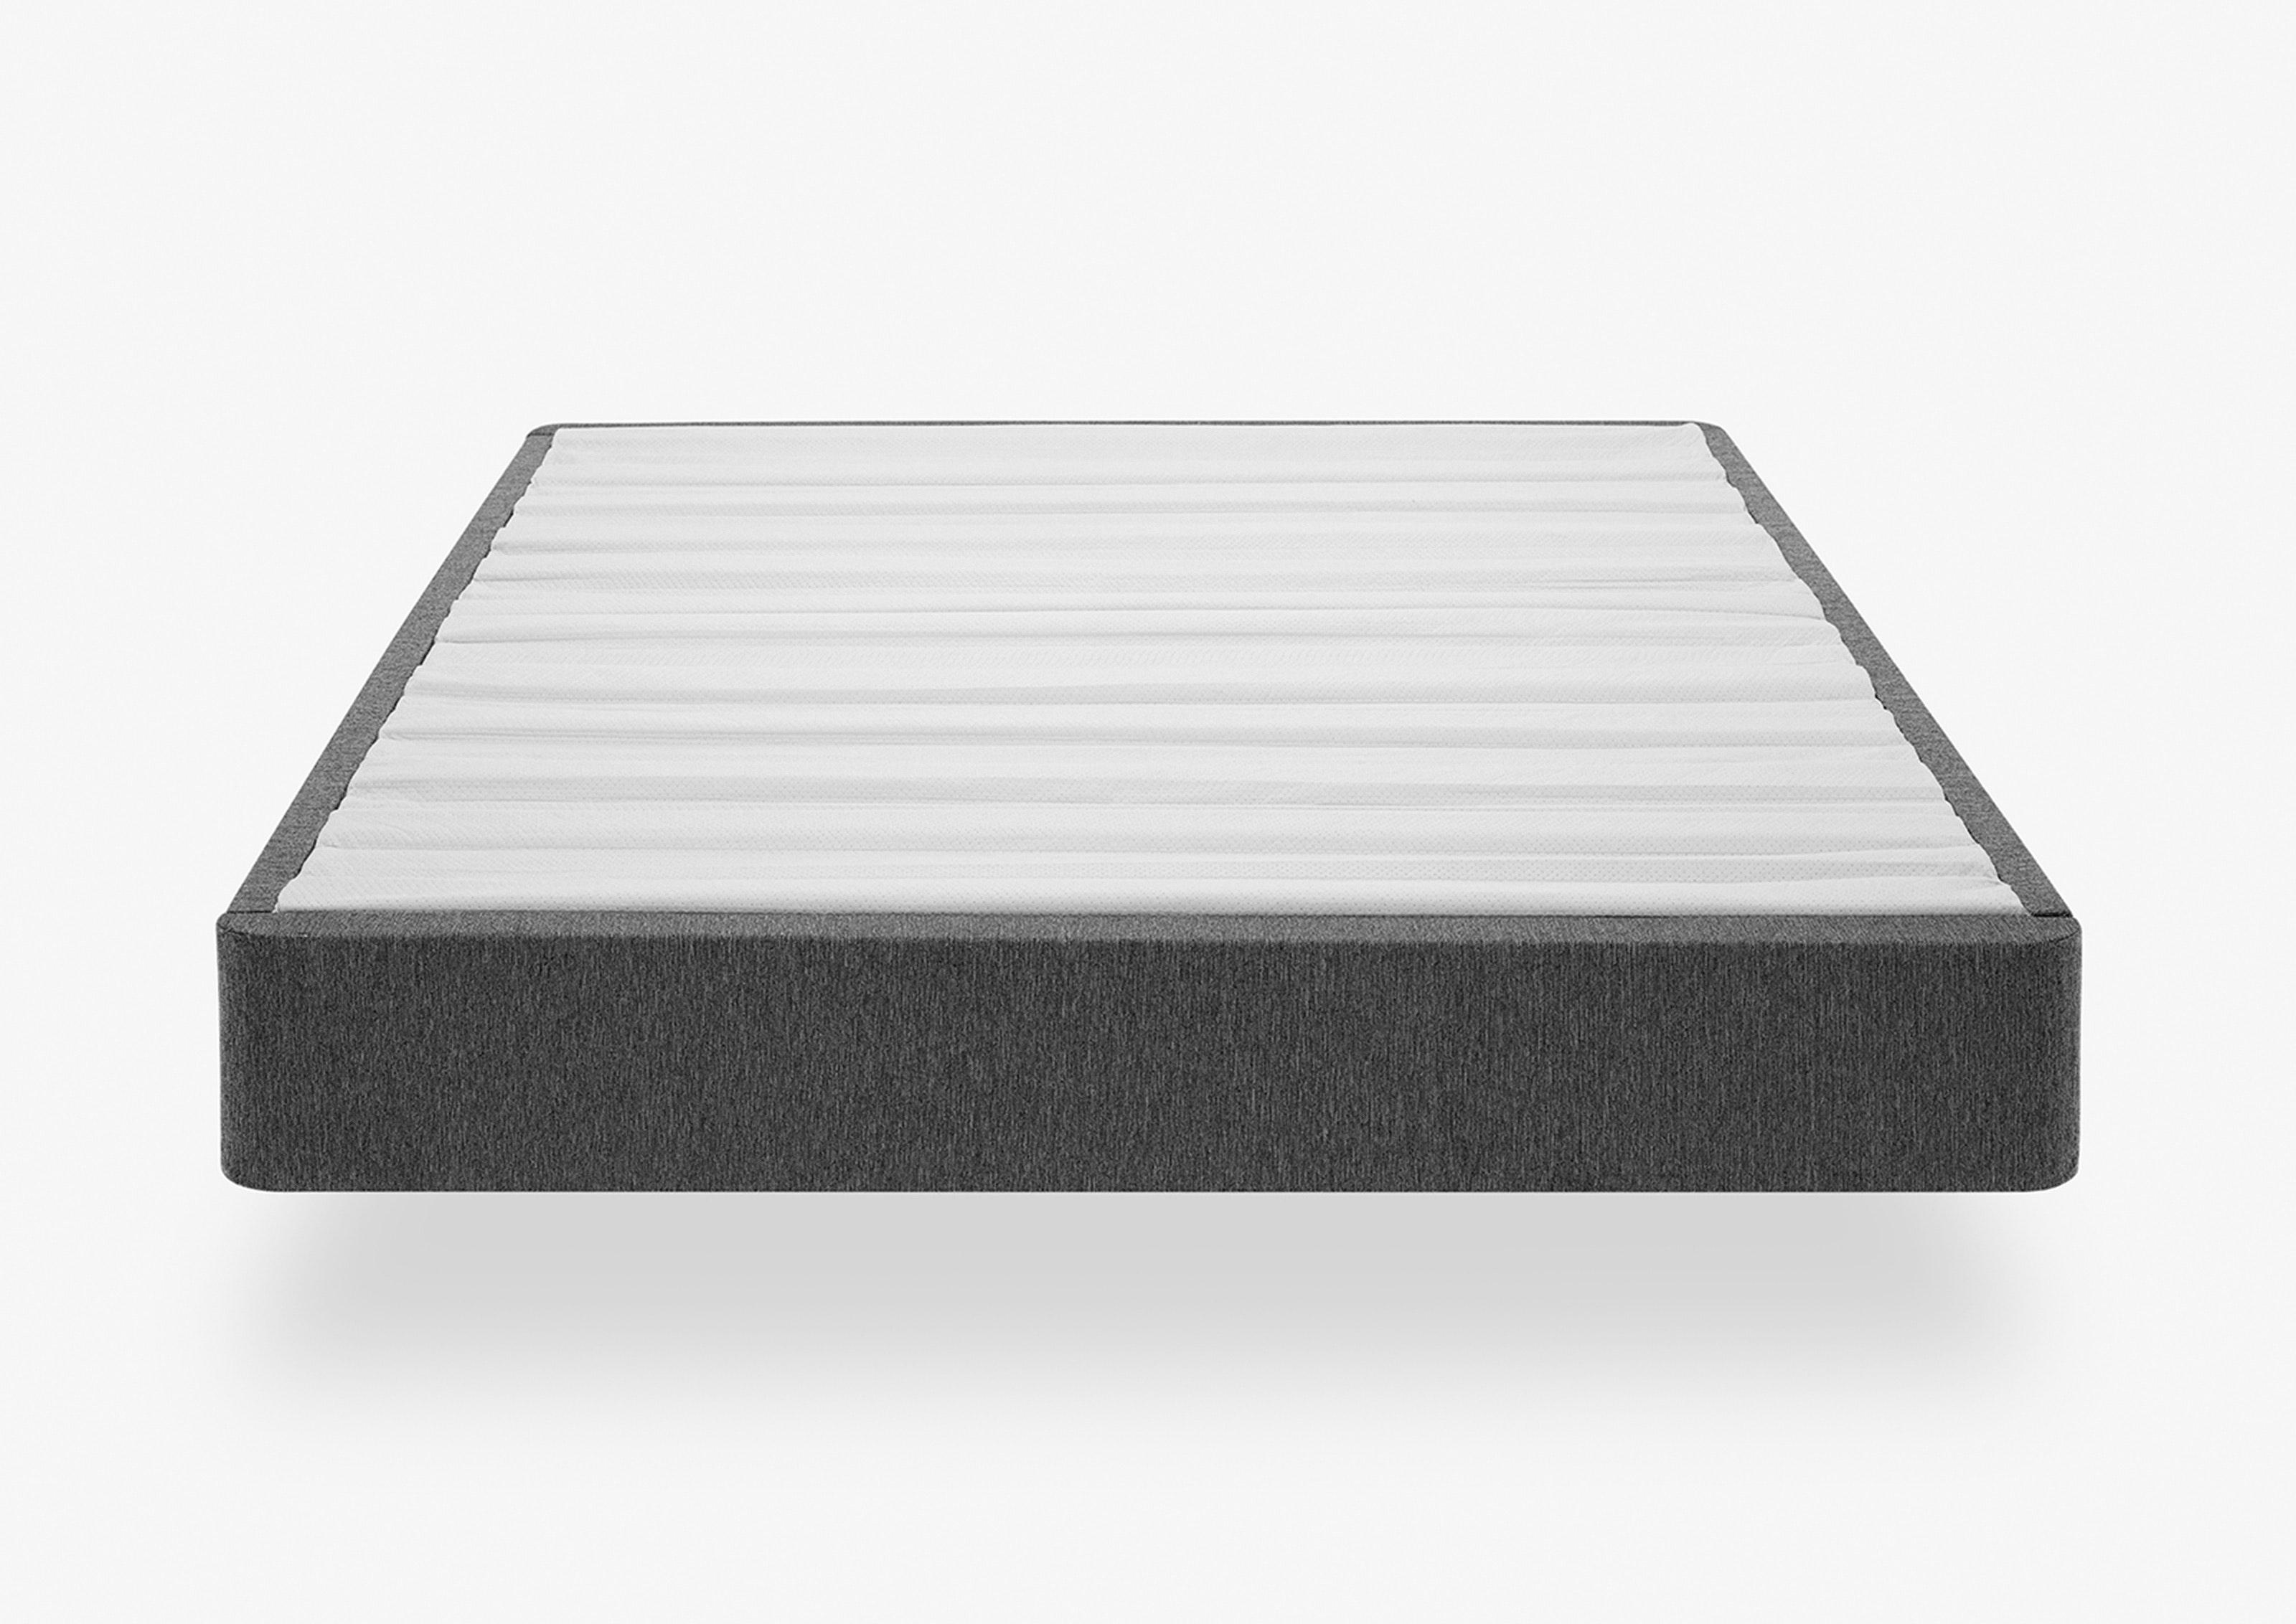 Mattress Foundation Base Box Spring Alternative Casper